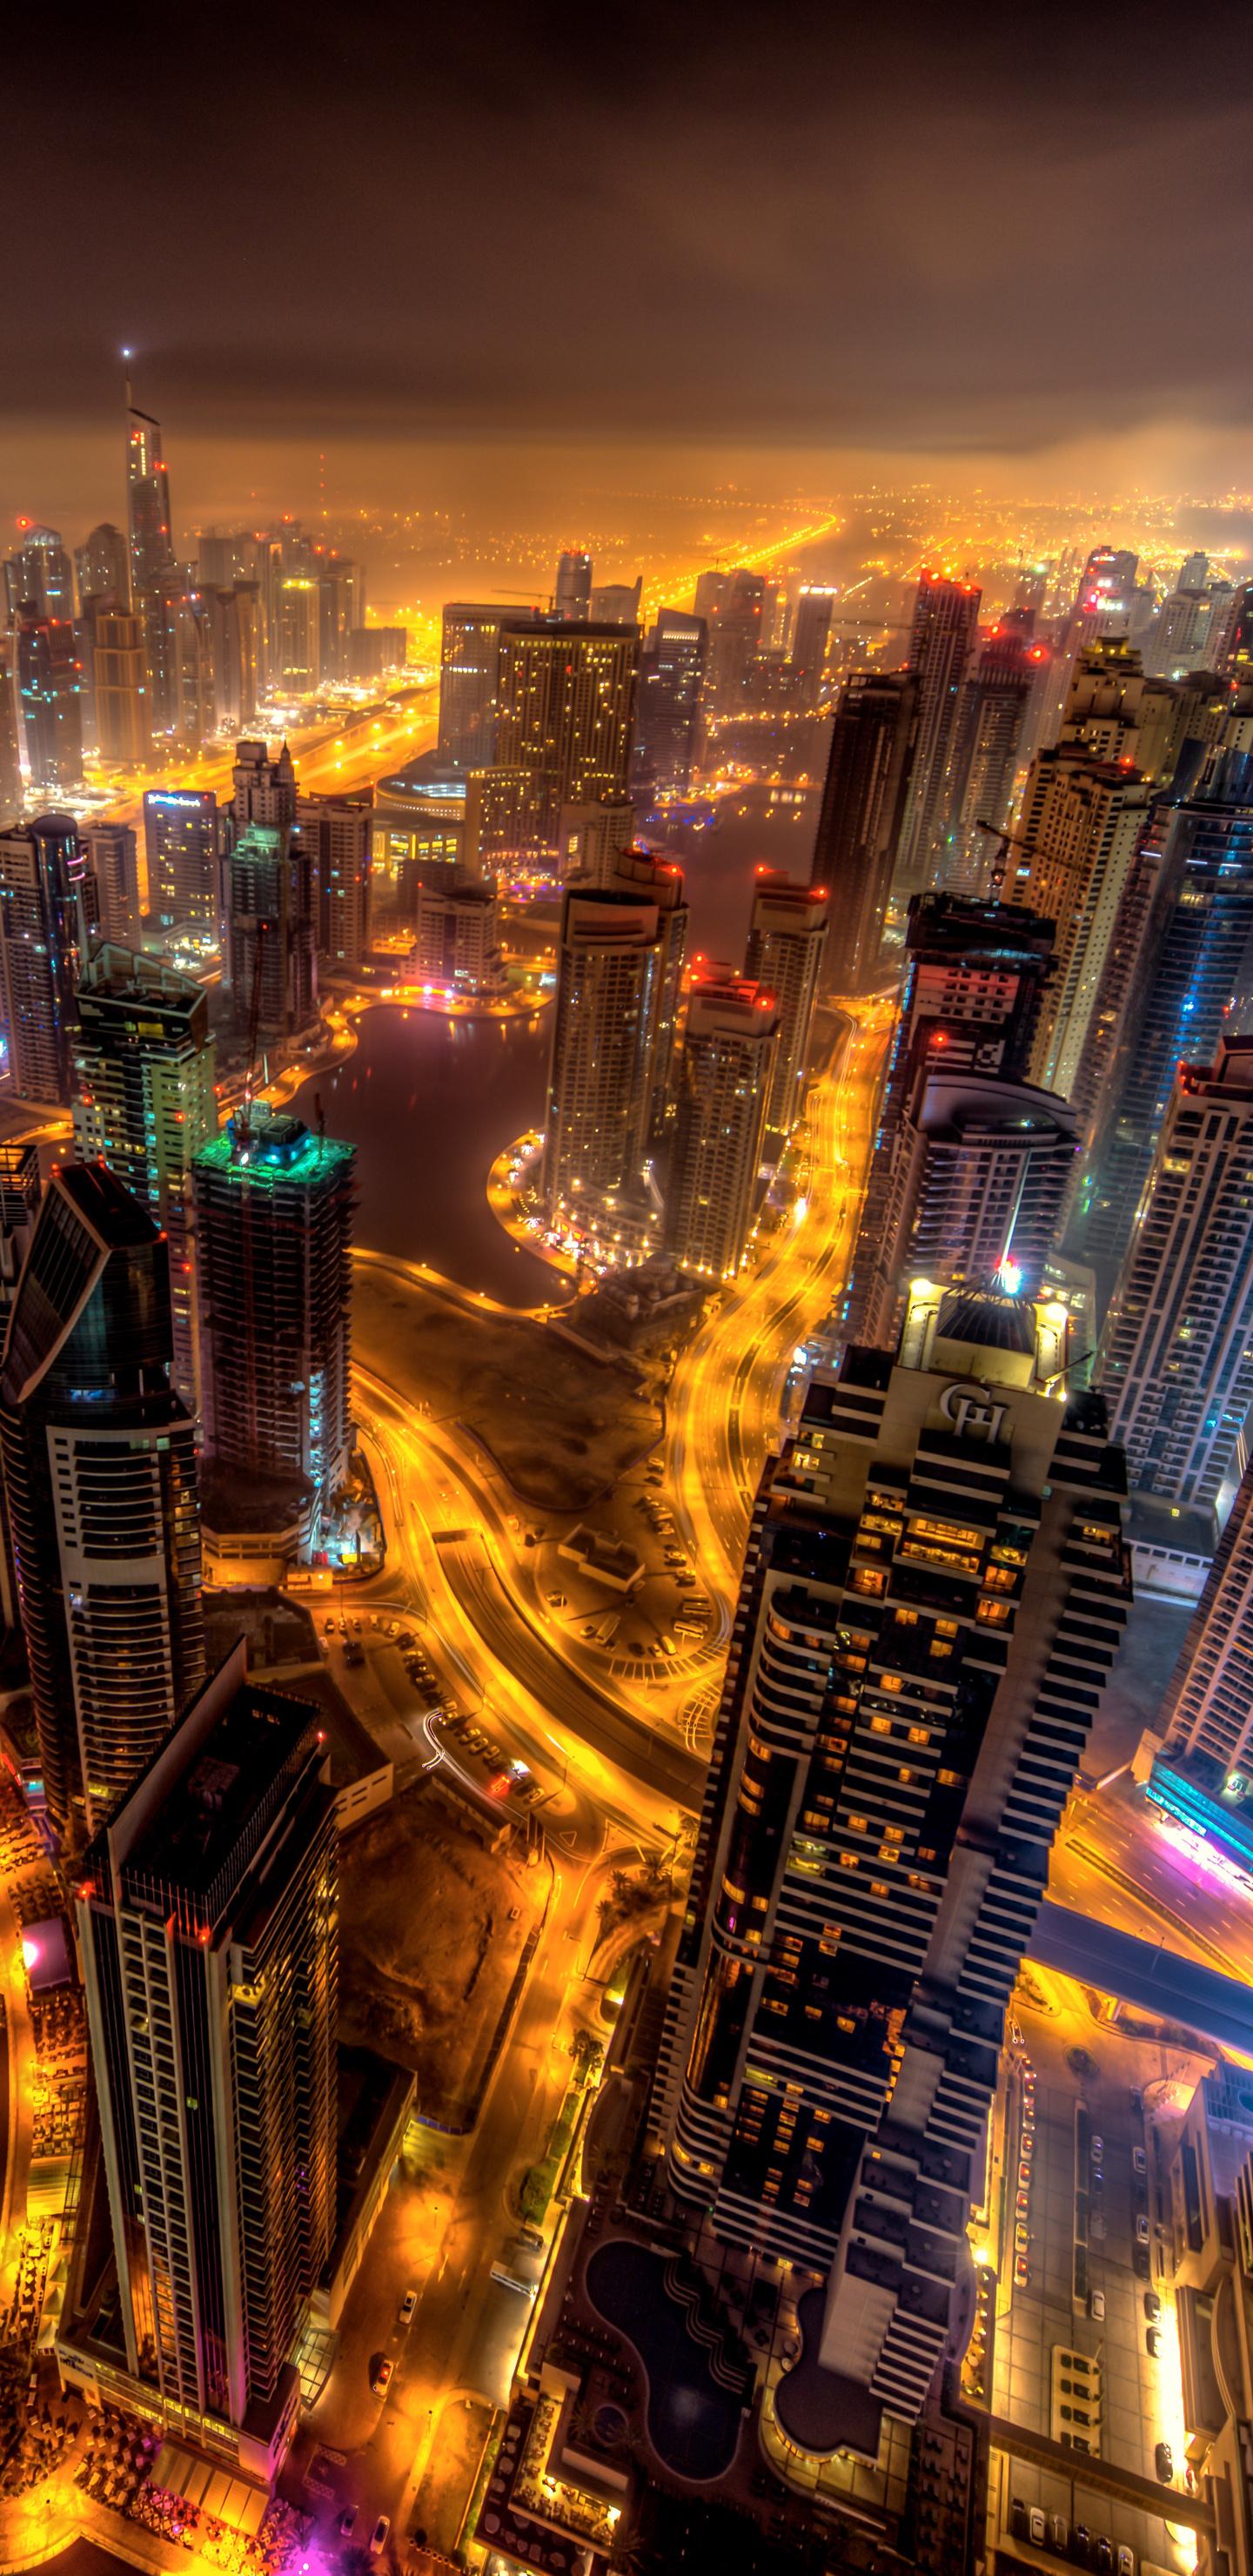 1440x2960 dubai buildings night lights top view 8k samsung galaxy s8